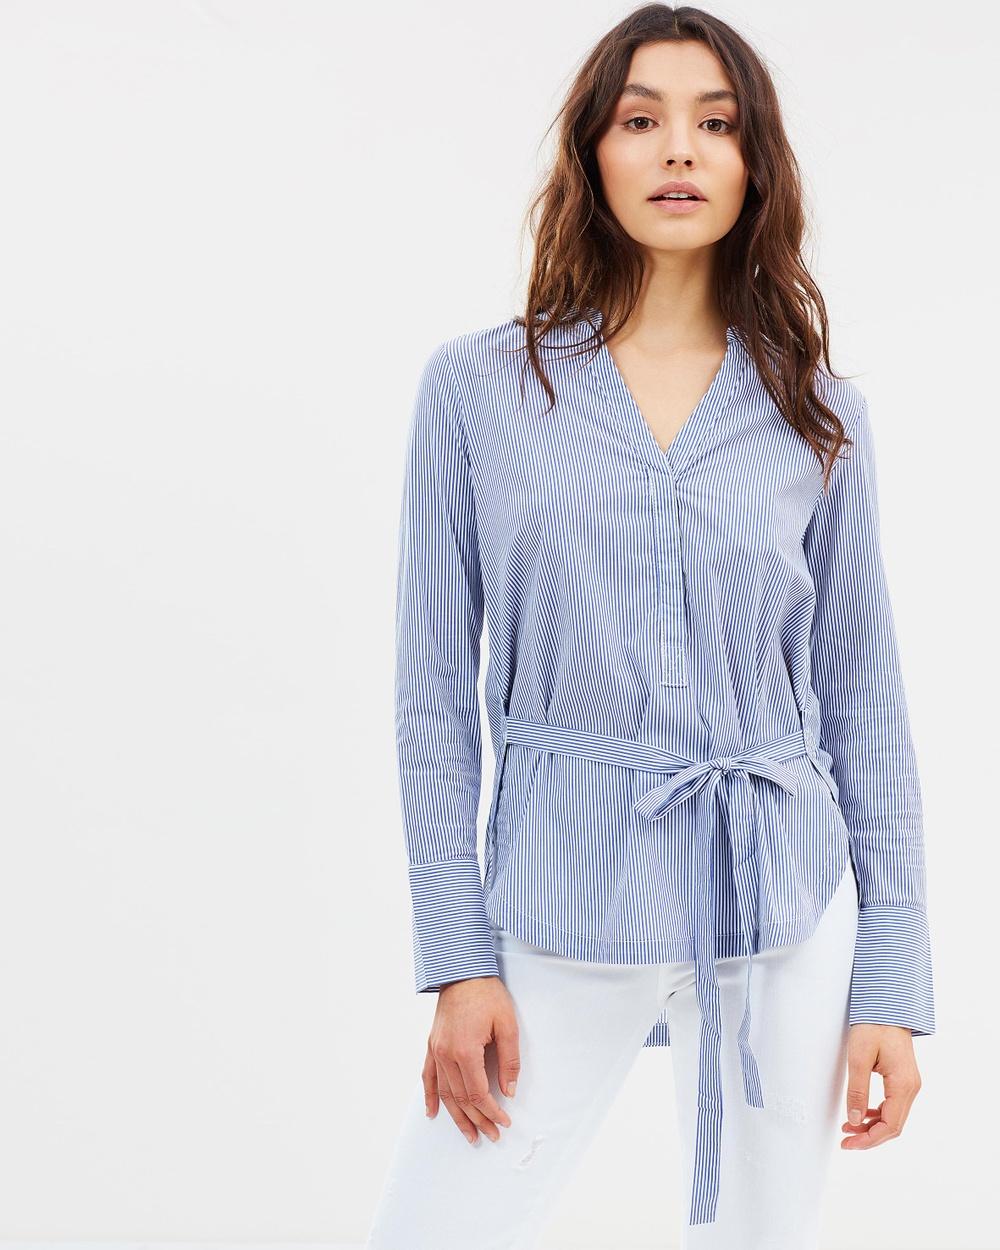 Elka Collective Esme Shirt Tops Blue Stripe Esme Shirt